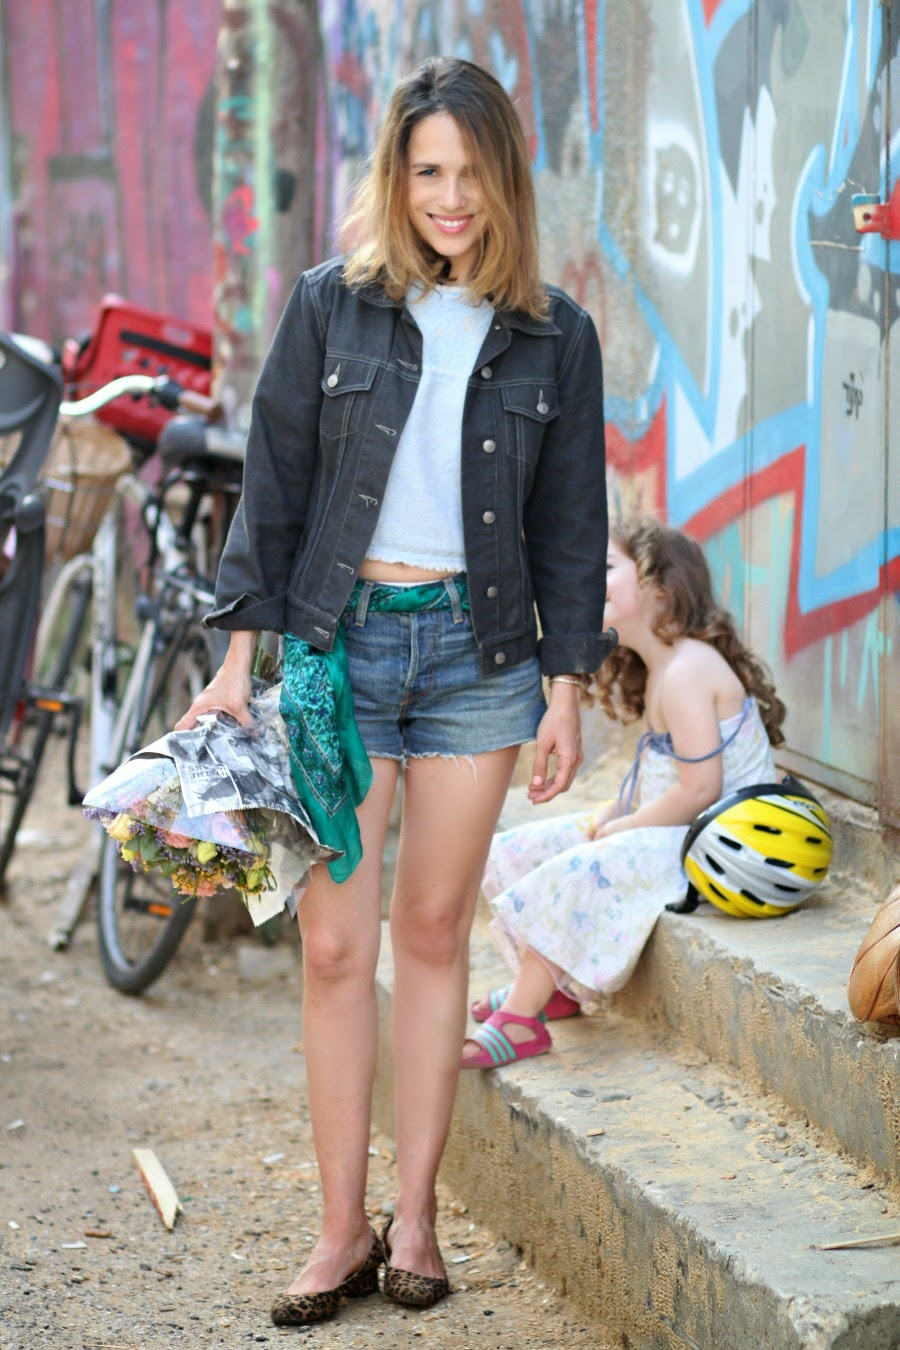 frayedhem, spring2015, bike, wear, ootd, levis501, fashionblog, denim, ootd, streetstyle, fashiontelaviv